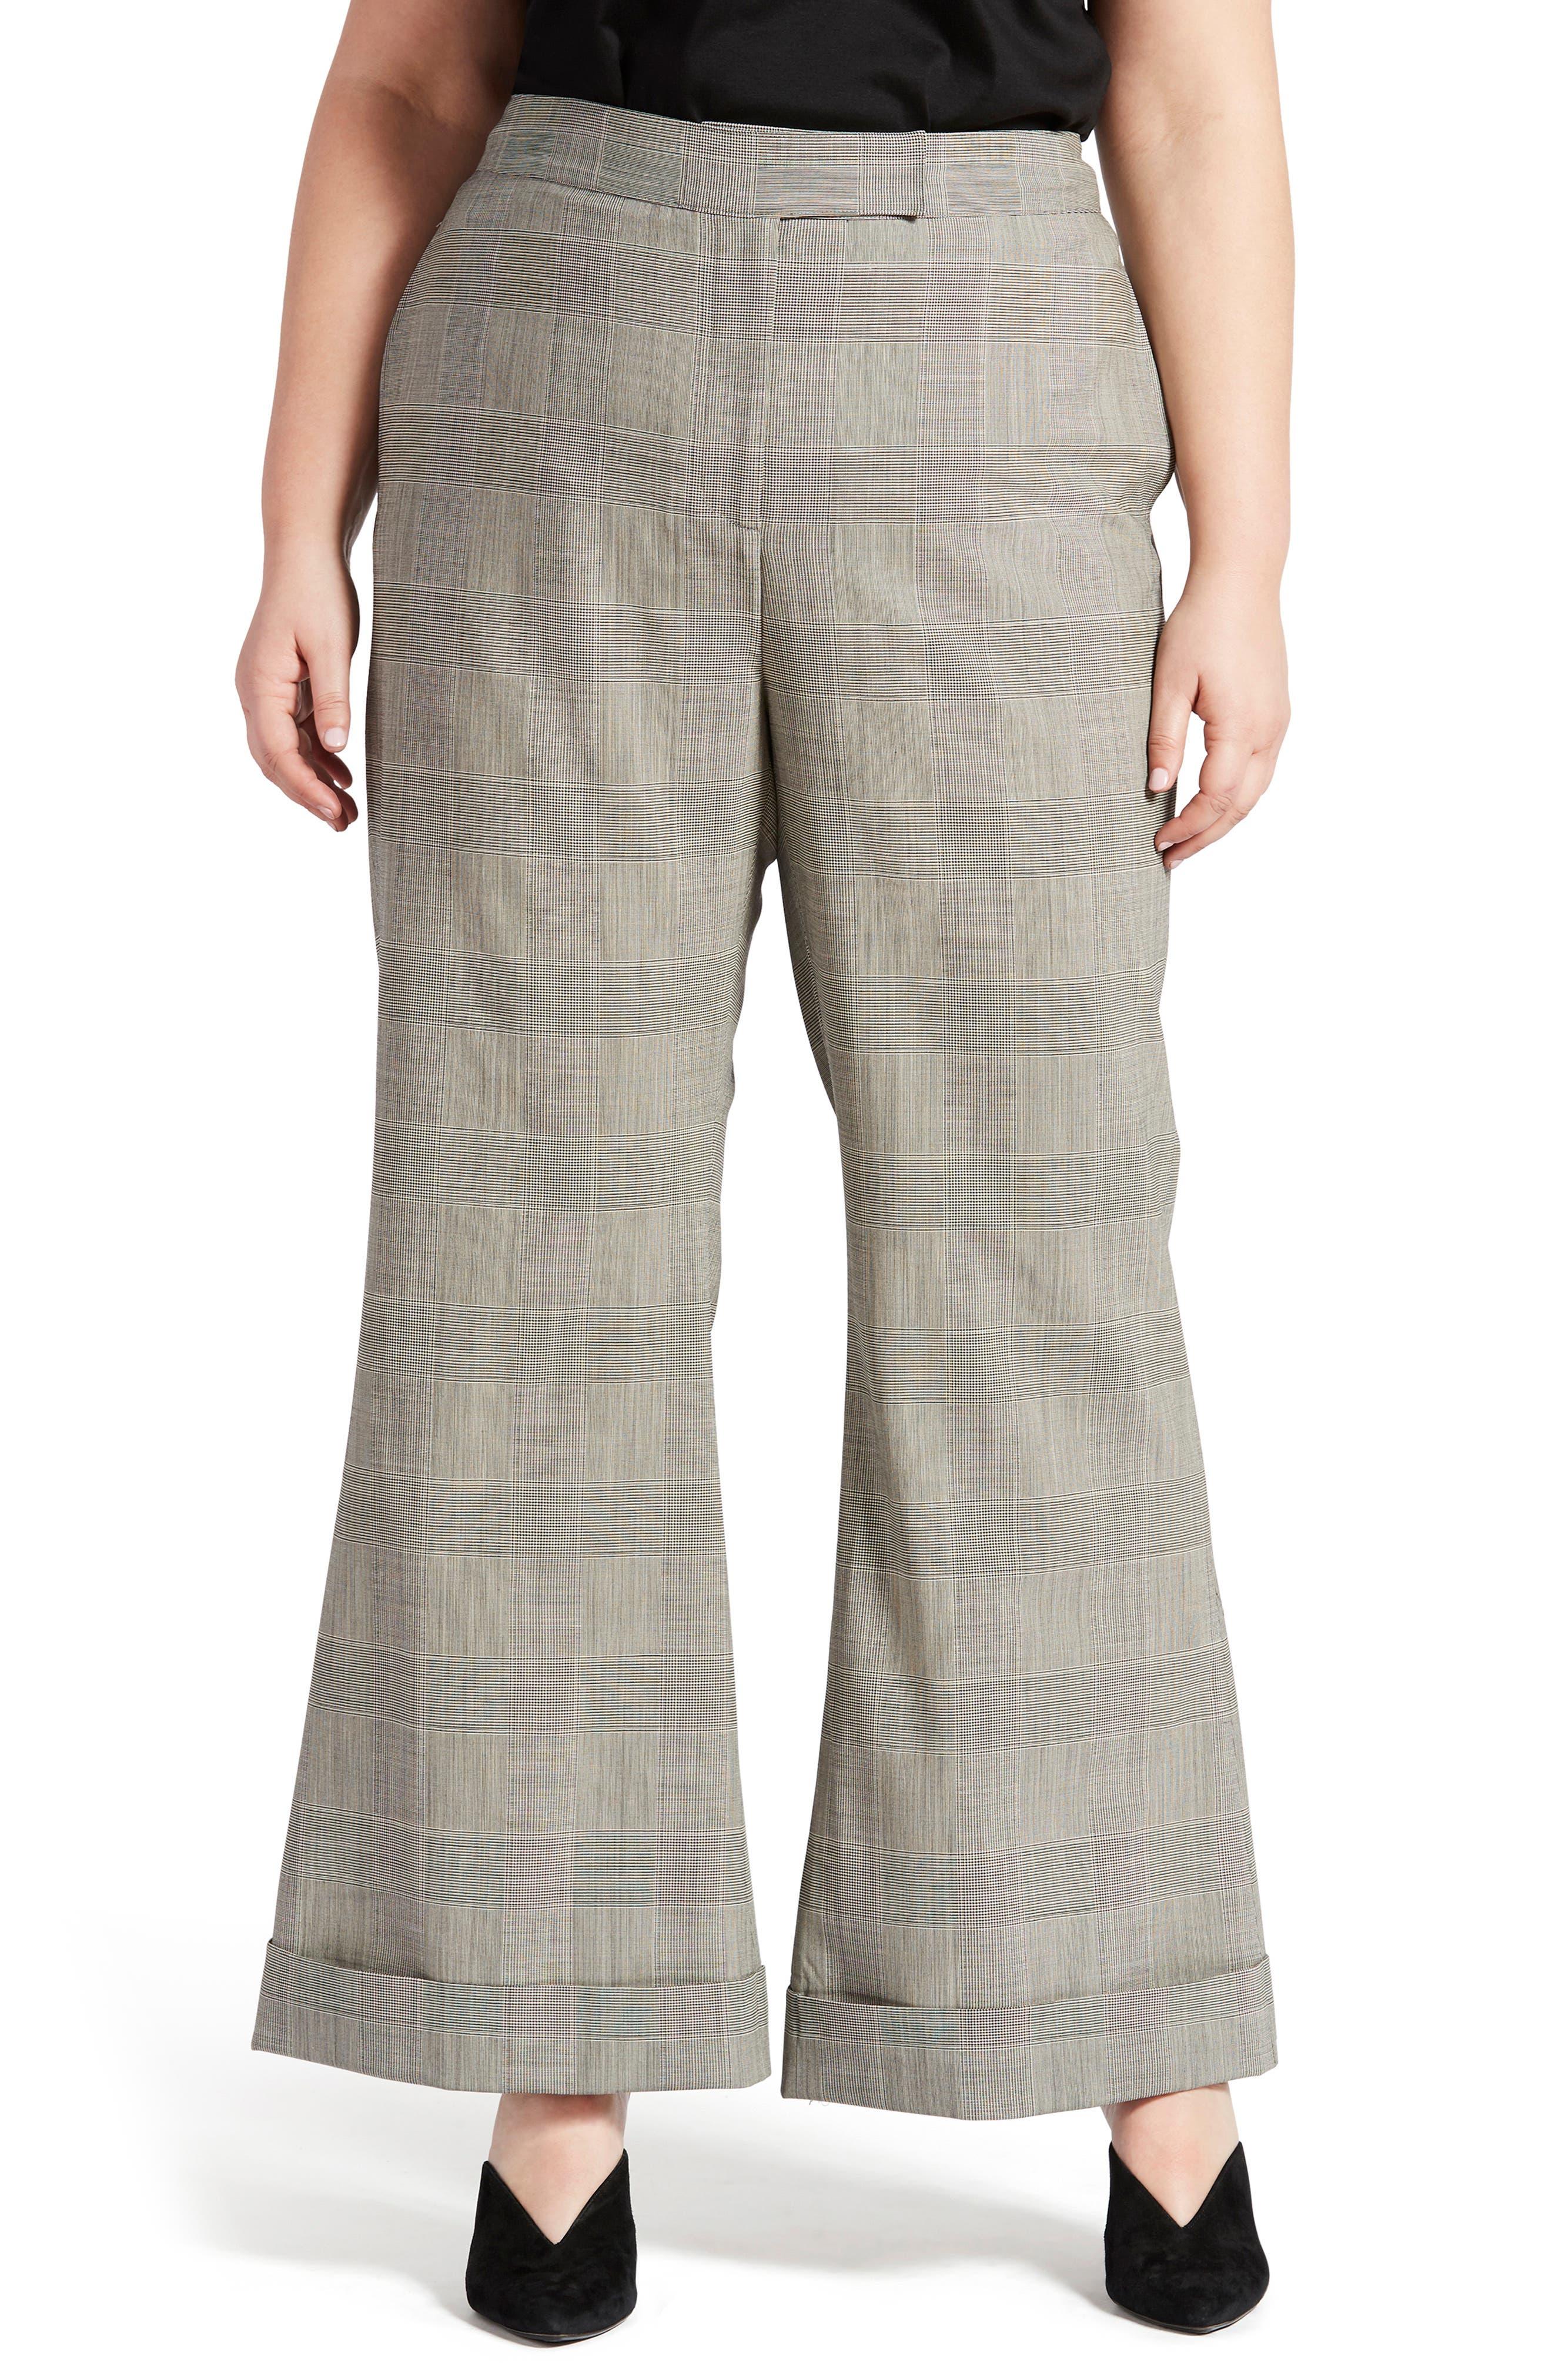 Plus  Women's Pari Passu Wool Blend Wide Leg Pants,  5 (fits like 20 US) Shape D (Hourglass) - Black